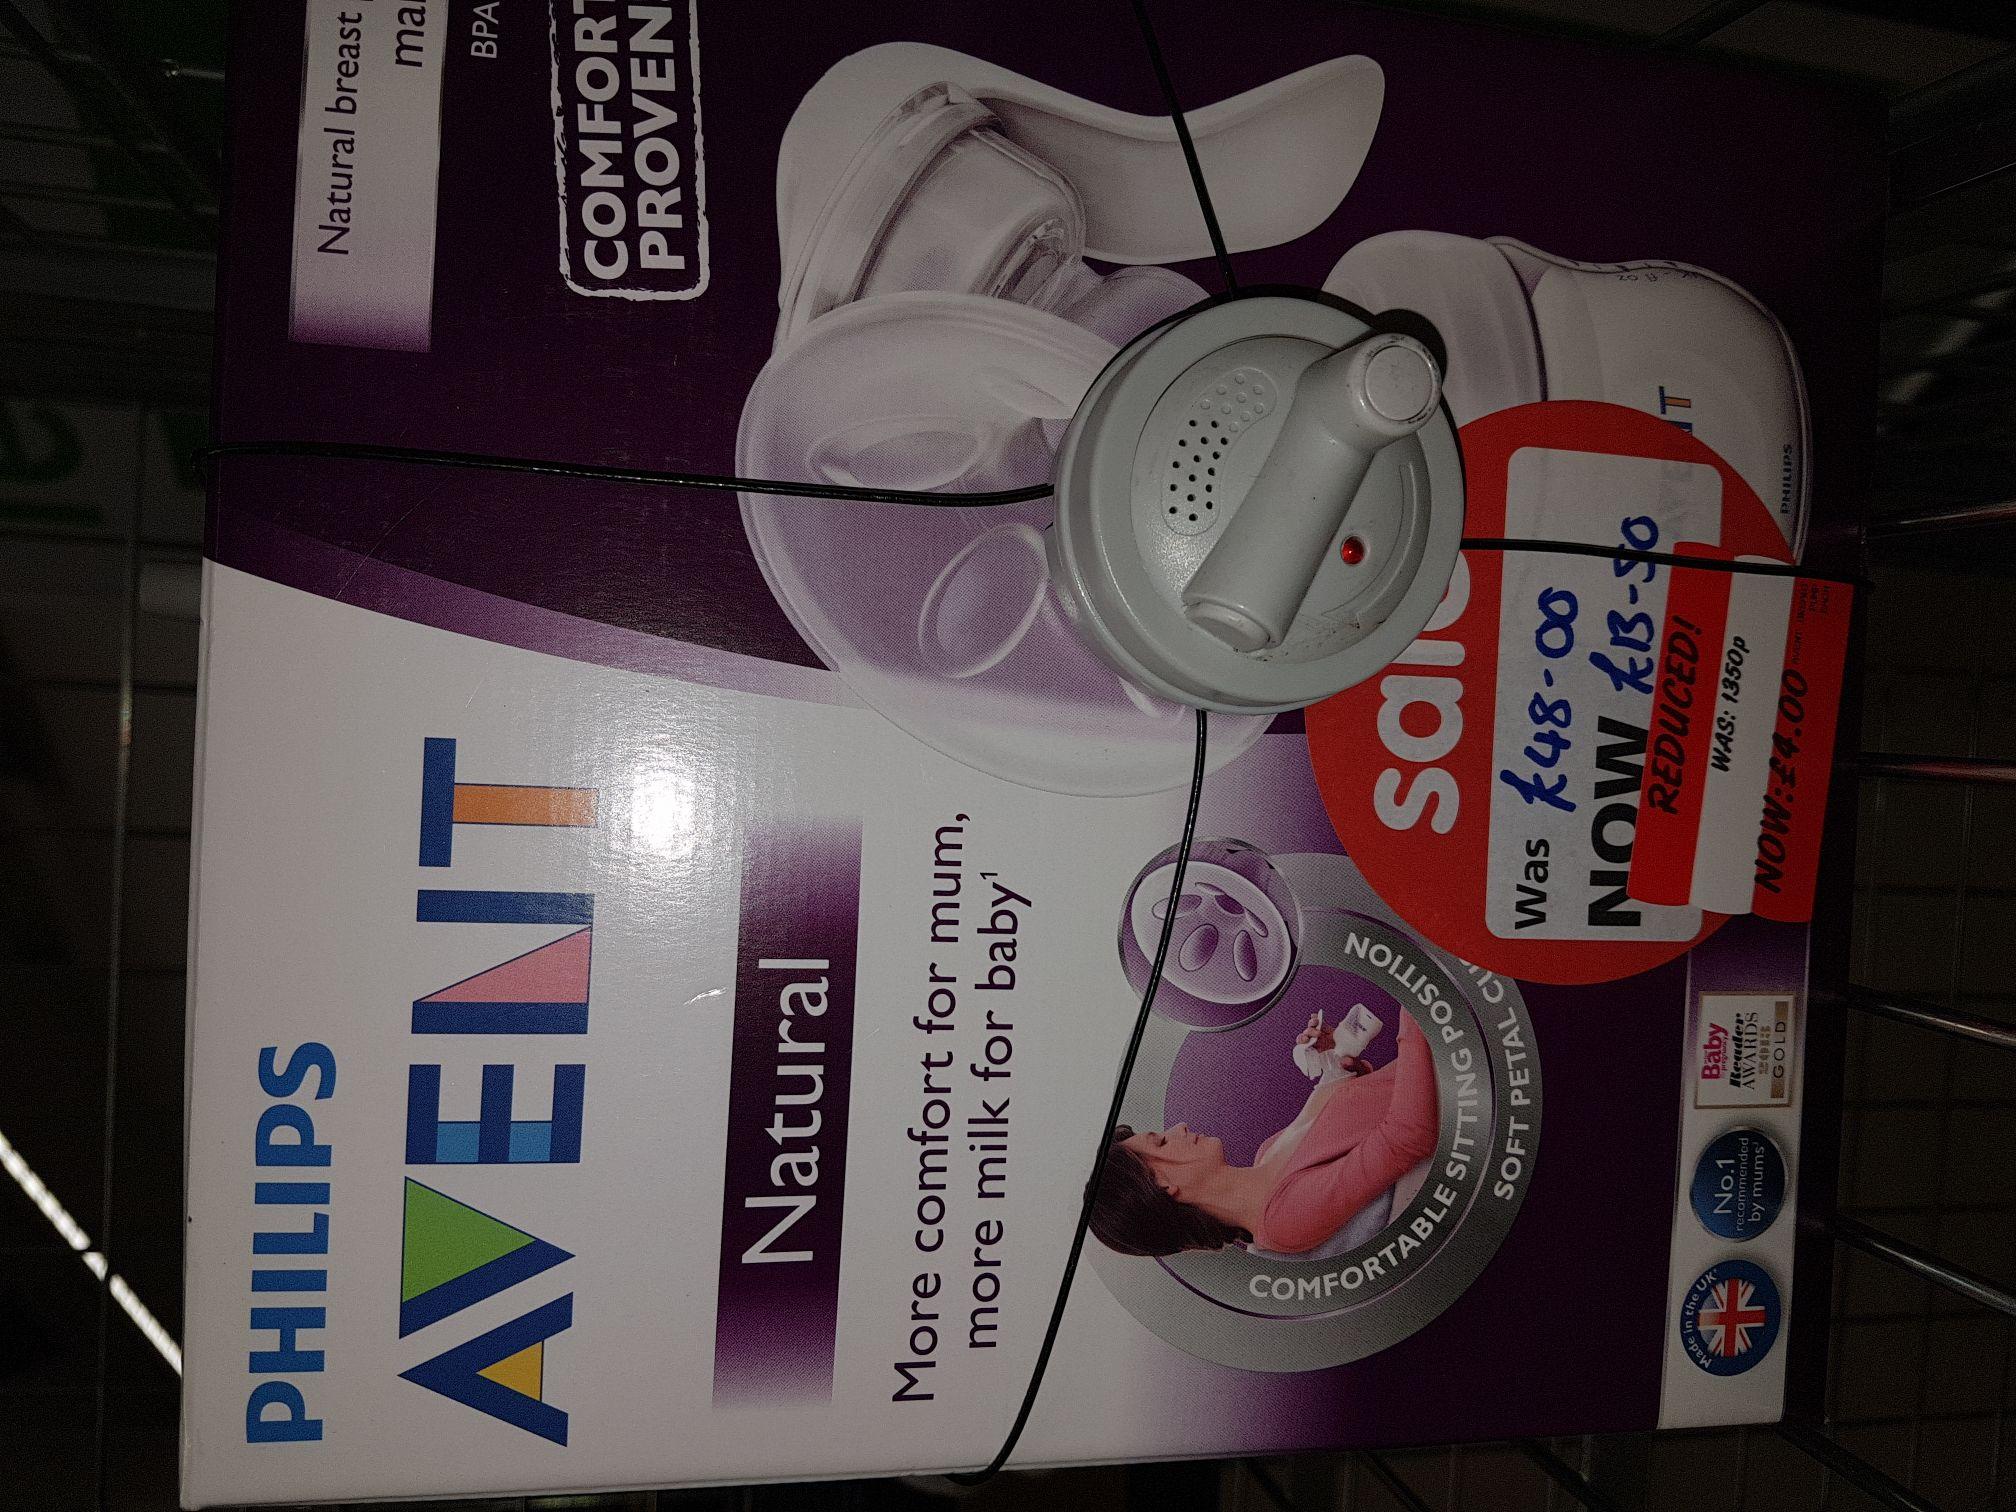 Philips advent breast pump ASDA (Halesowen) - £4